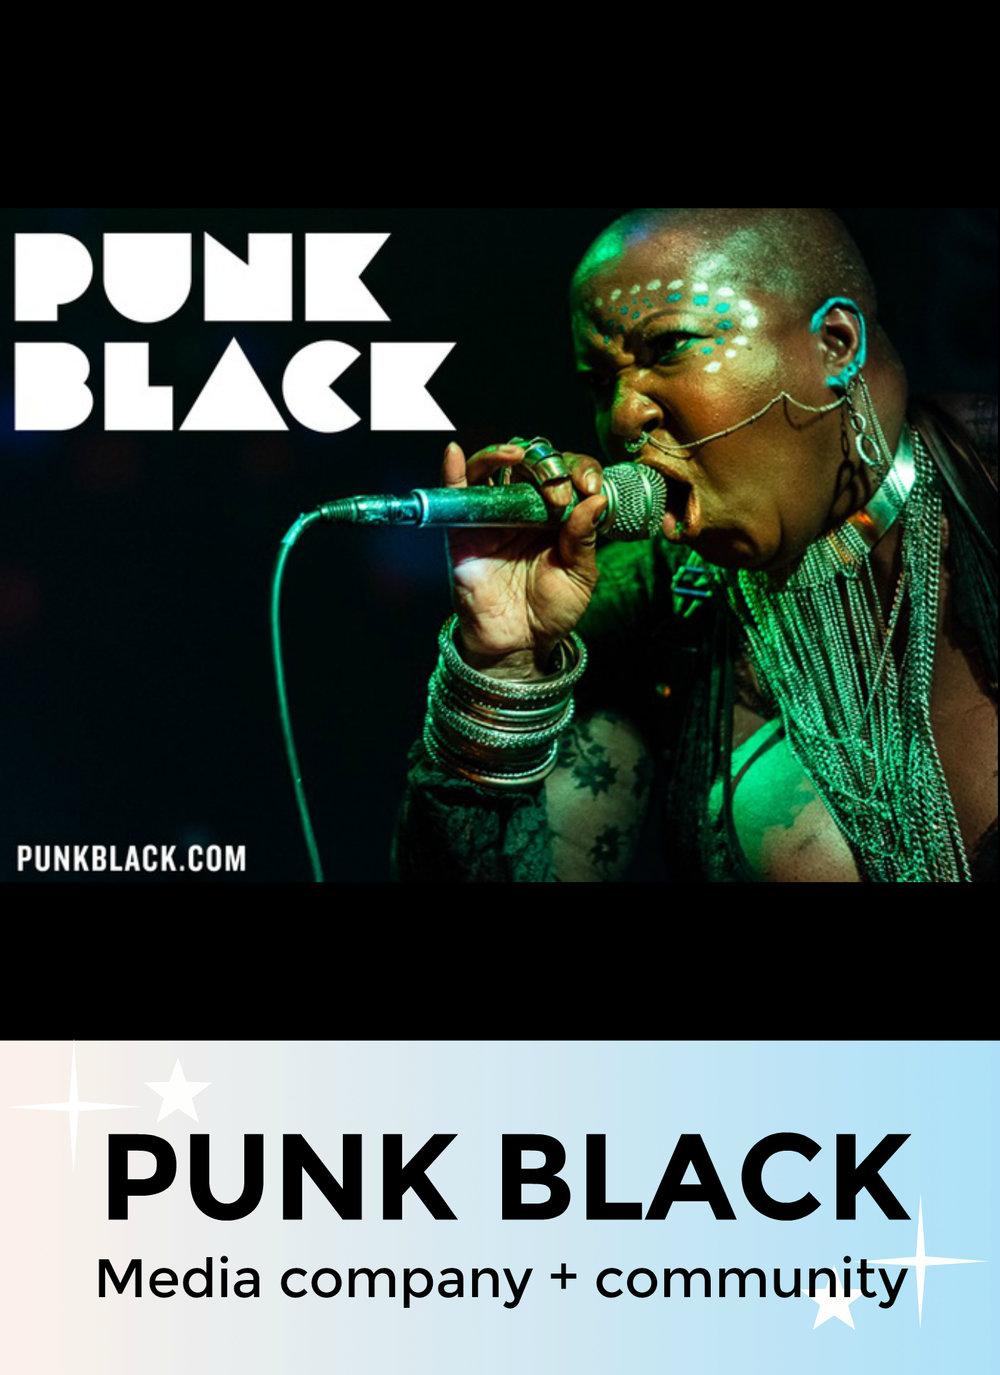 qc-punkblack-1.jpg